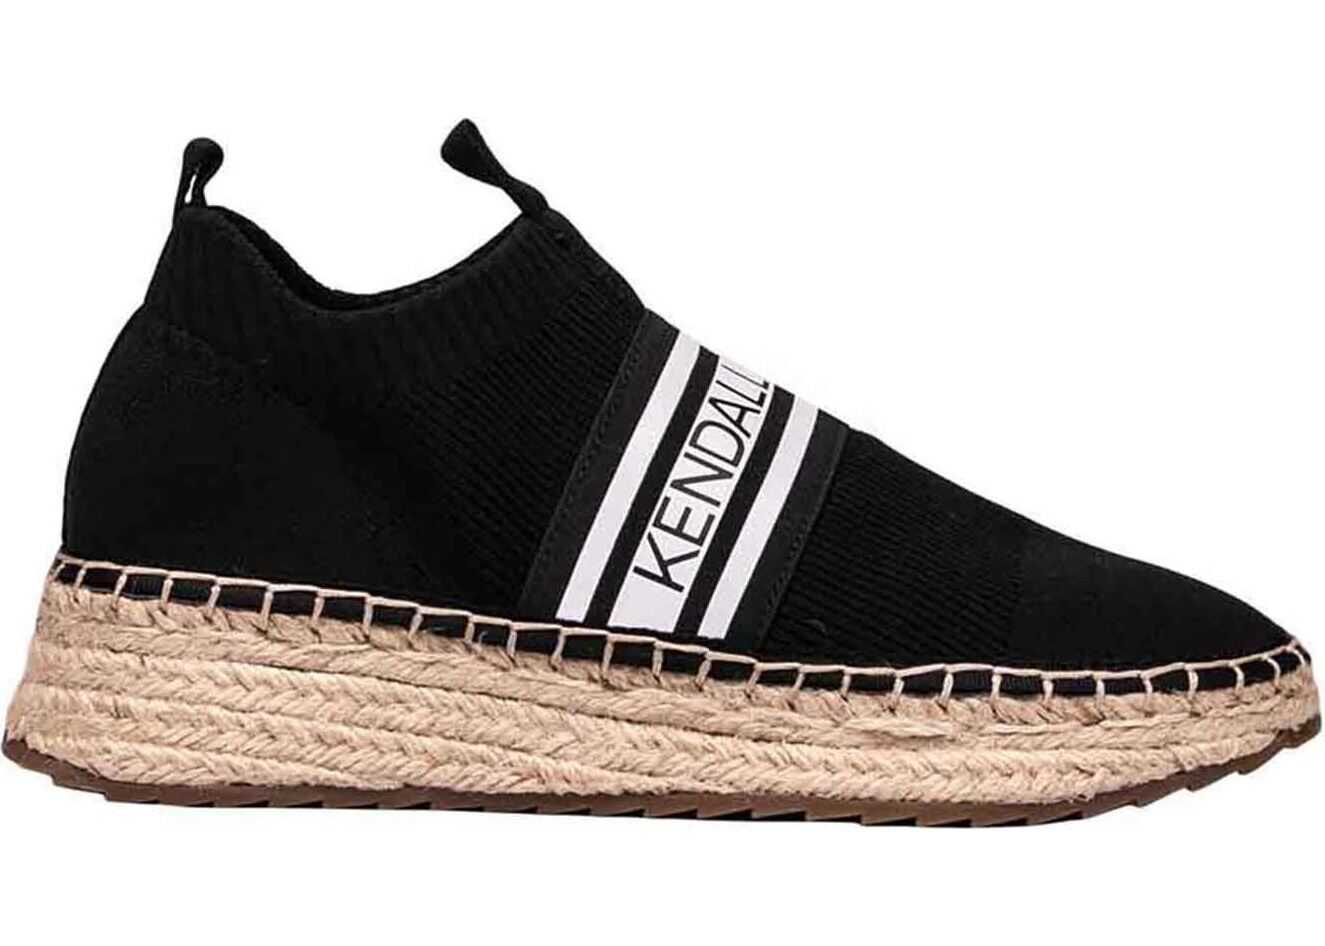 KENDALL + KYLIE Jake Sneaker In Black With Rope Sole Black